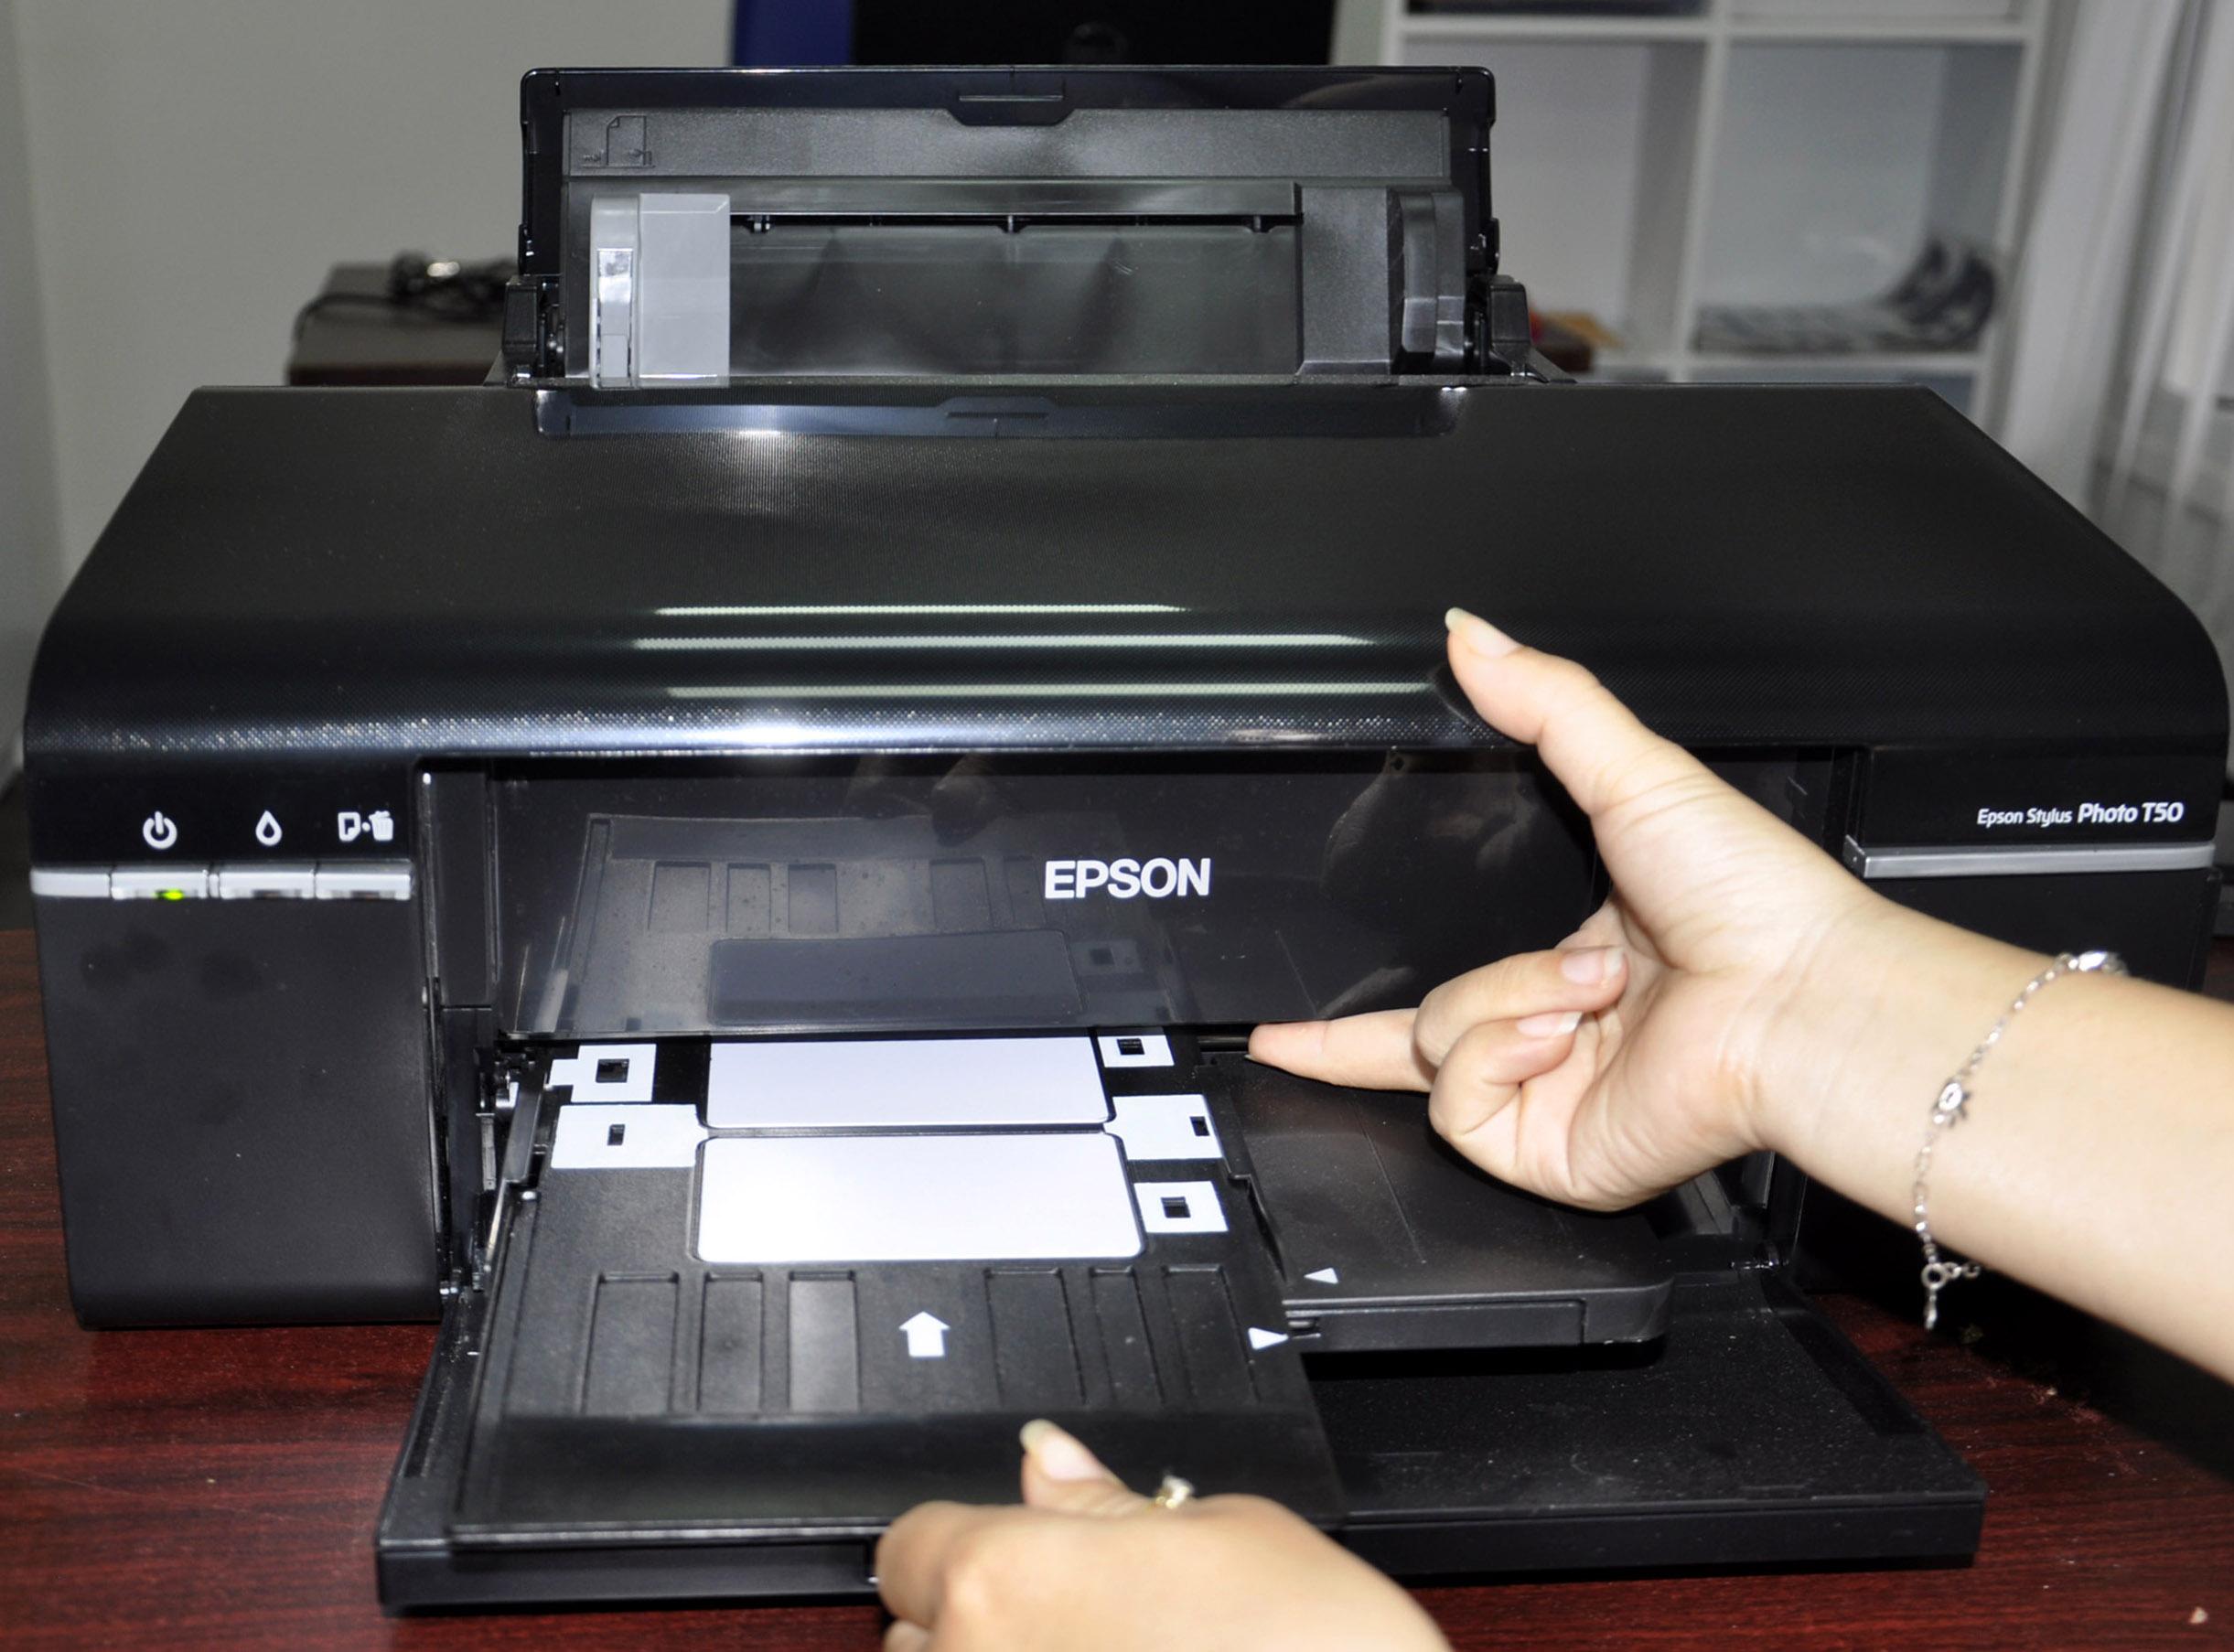 Sửa máy in màu Epson T50